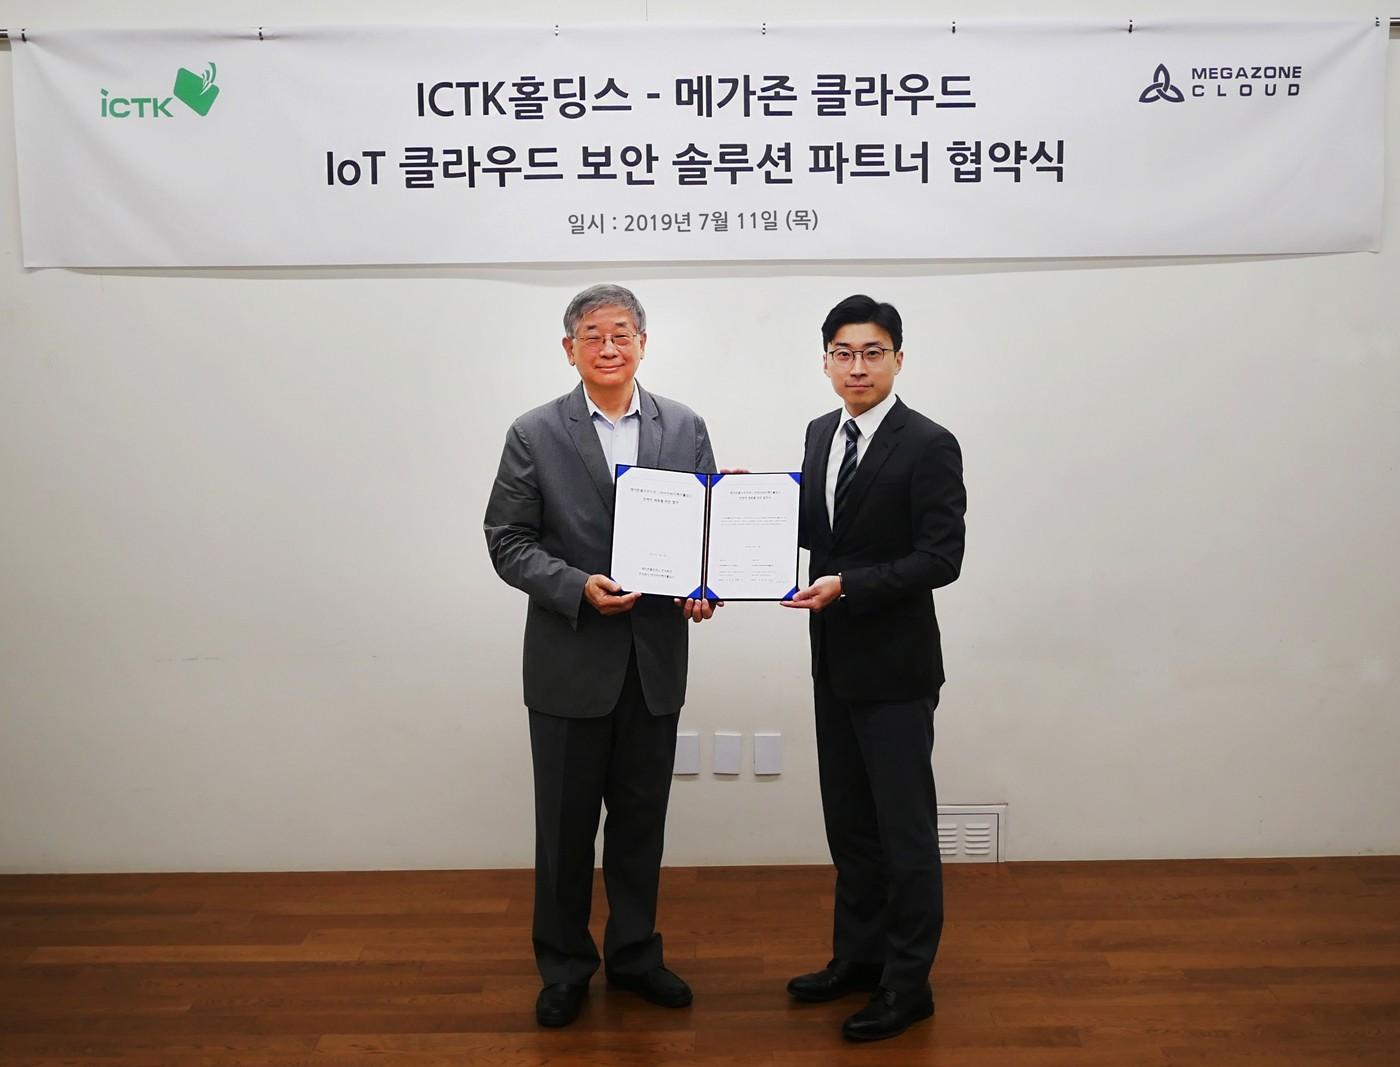 IoT 클라우드 융합보안 업무 협약식을 맺고 있는 유승삼 ICTK홀딩스 대표(왼쪽)와 이주완 메가존 클라우드 대표. 사진제공=메가존 클라우드